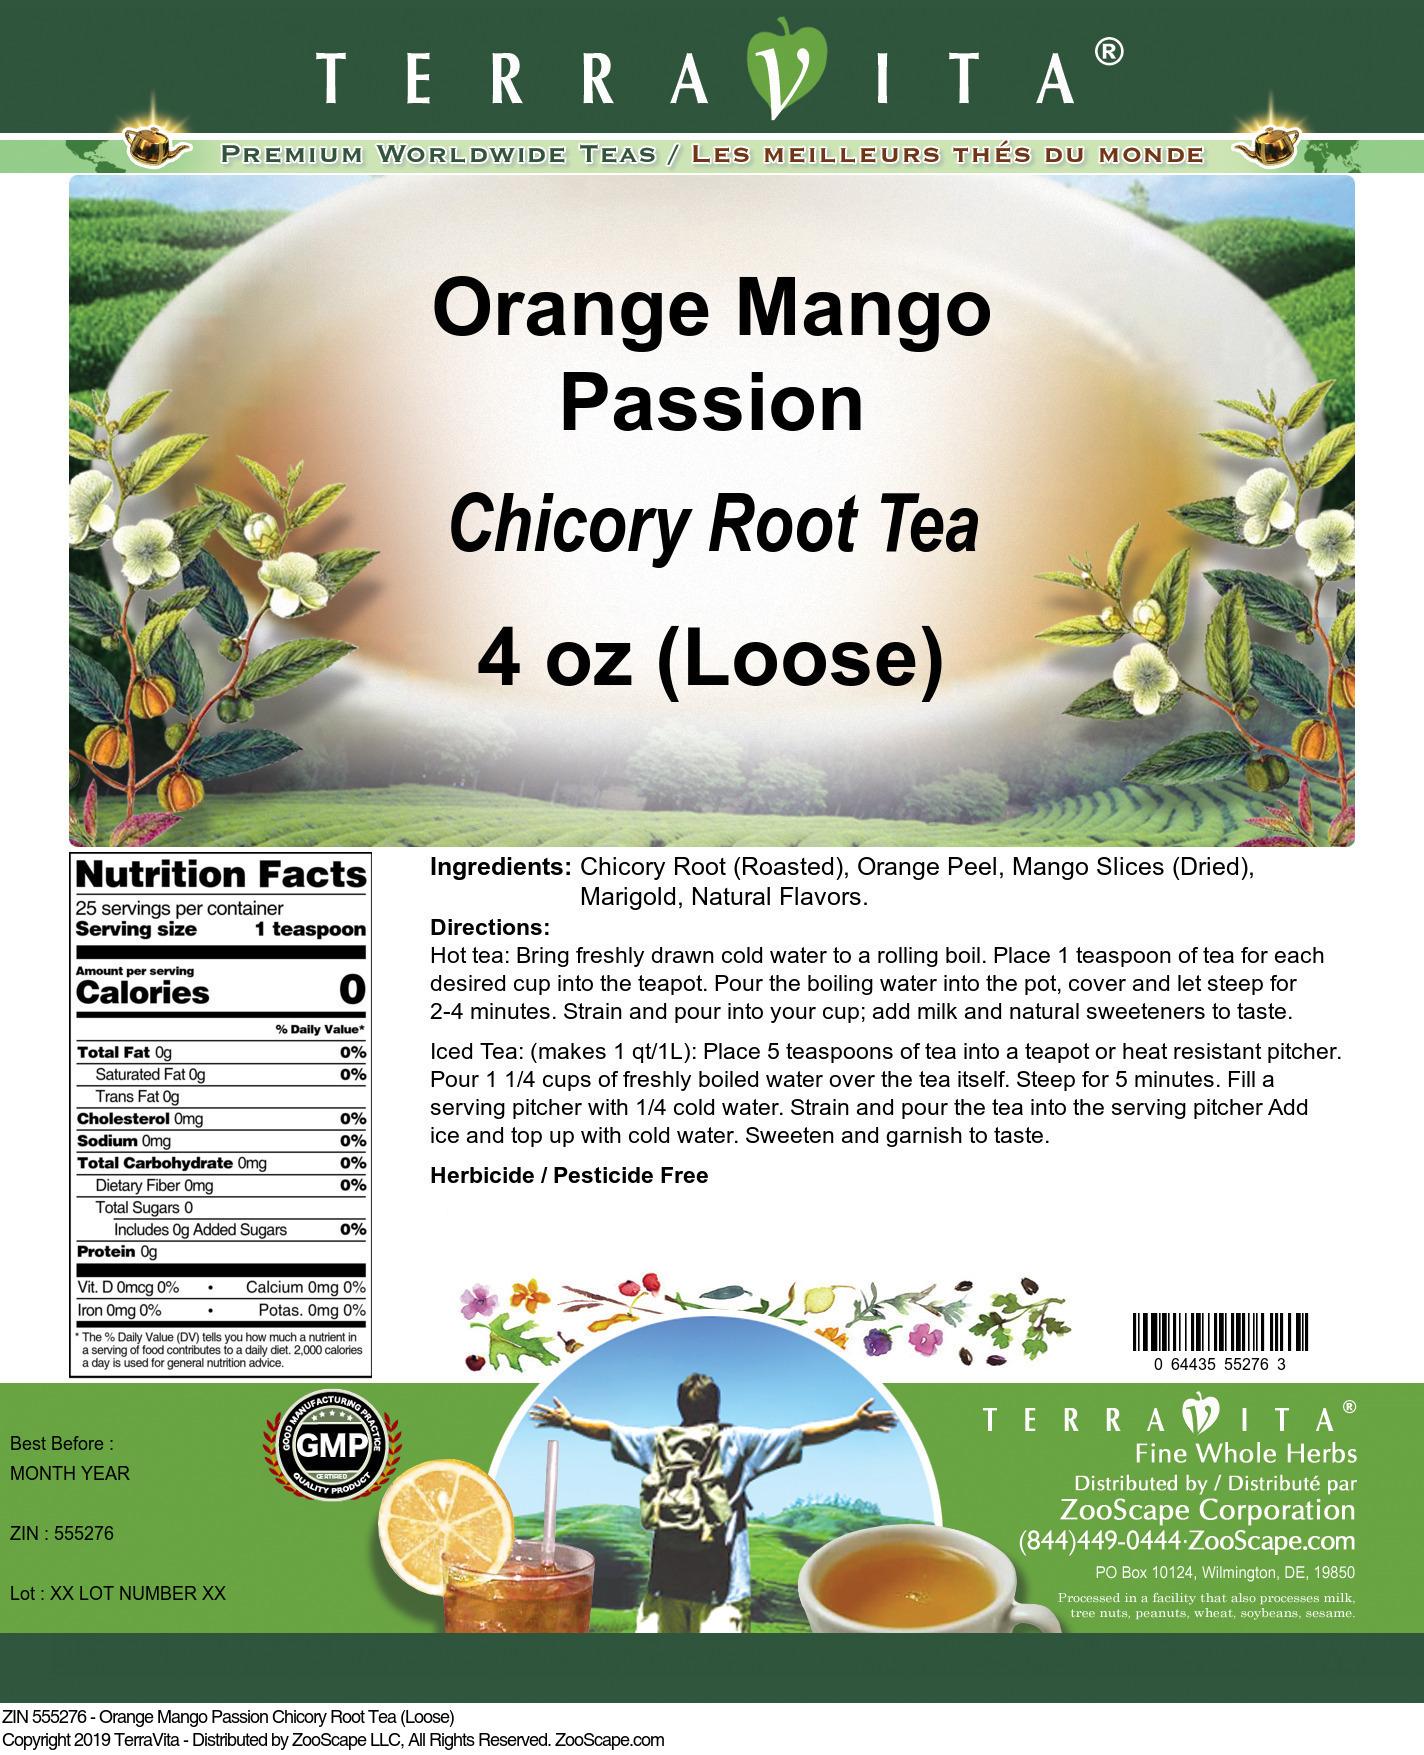 Orange Mango Passion Chicory Root Tea (Loose)